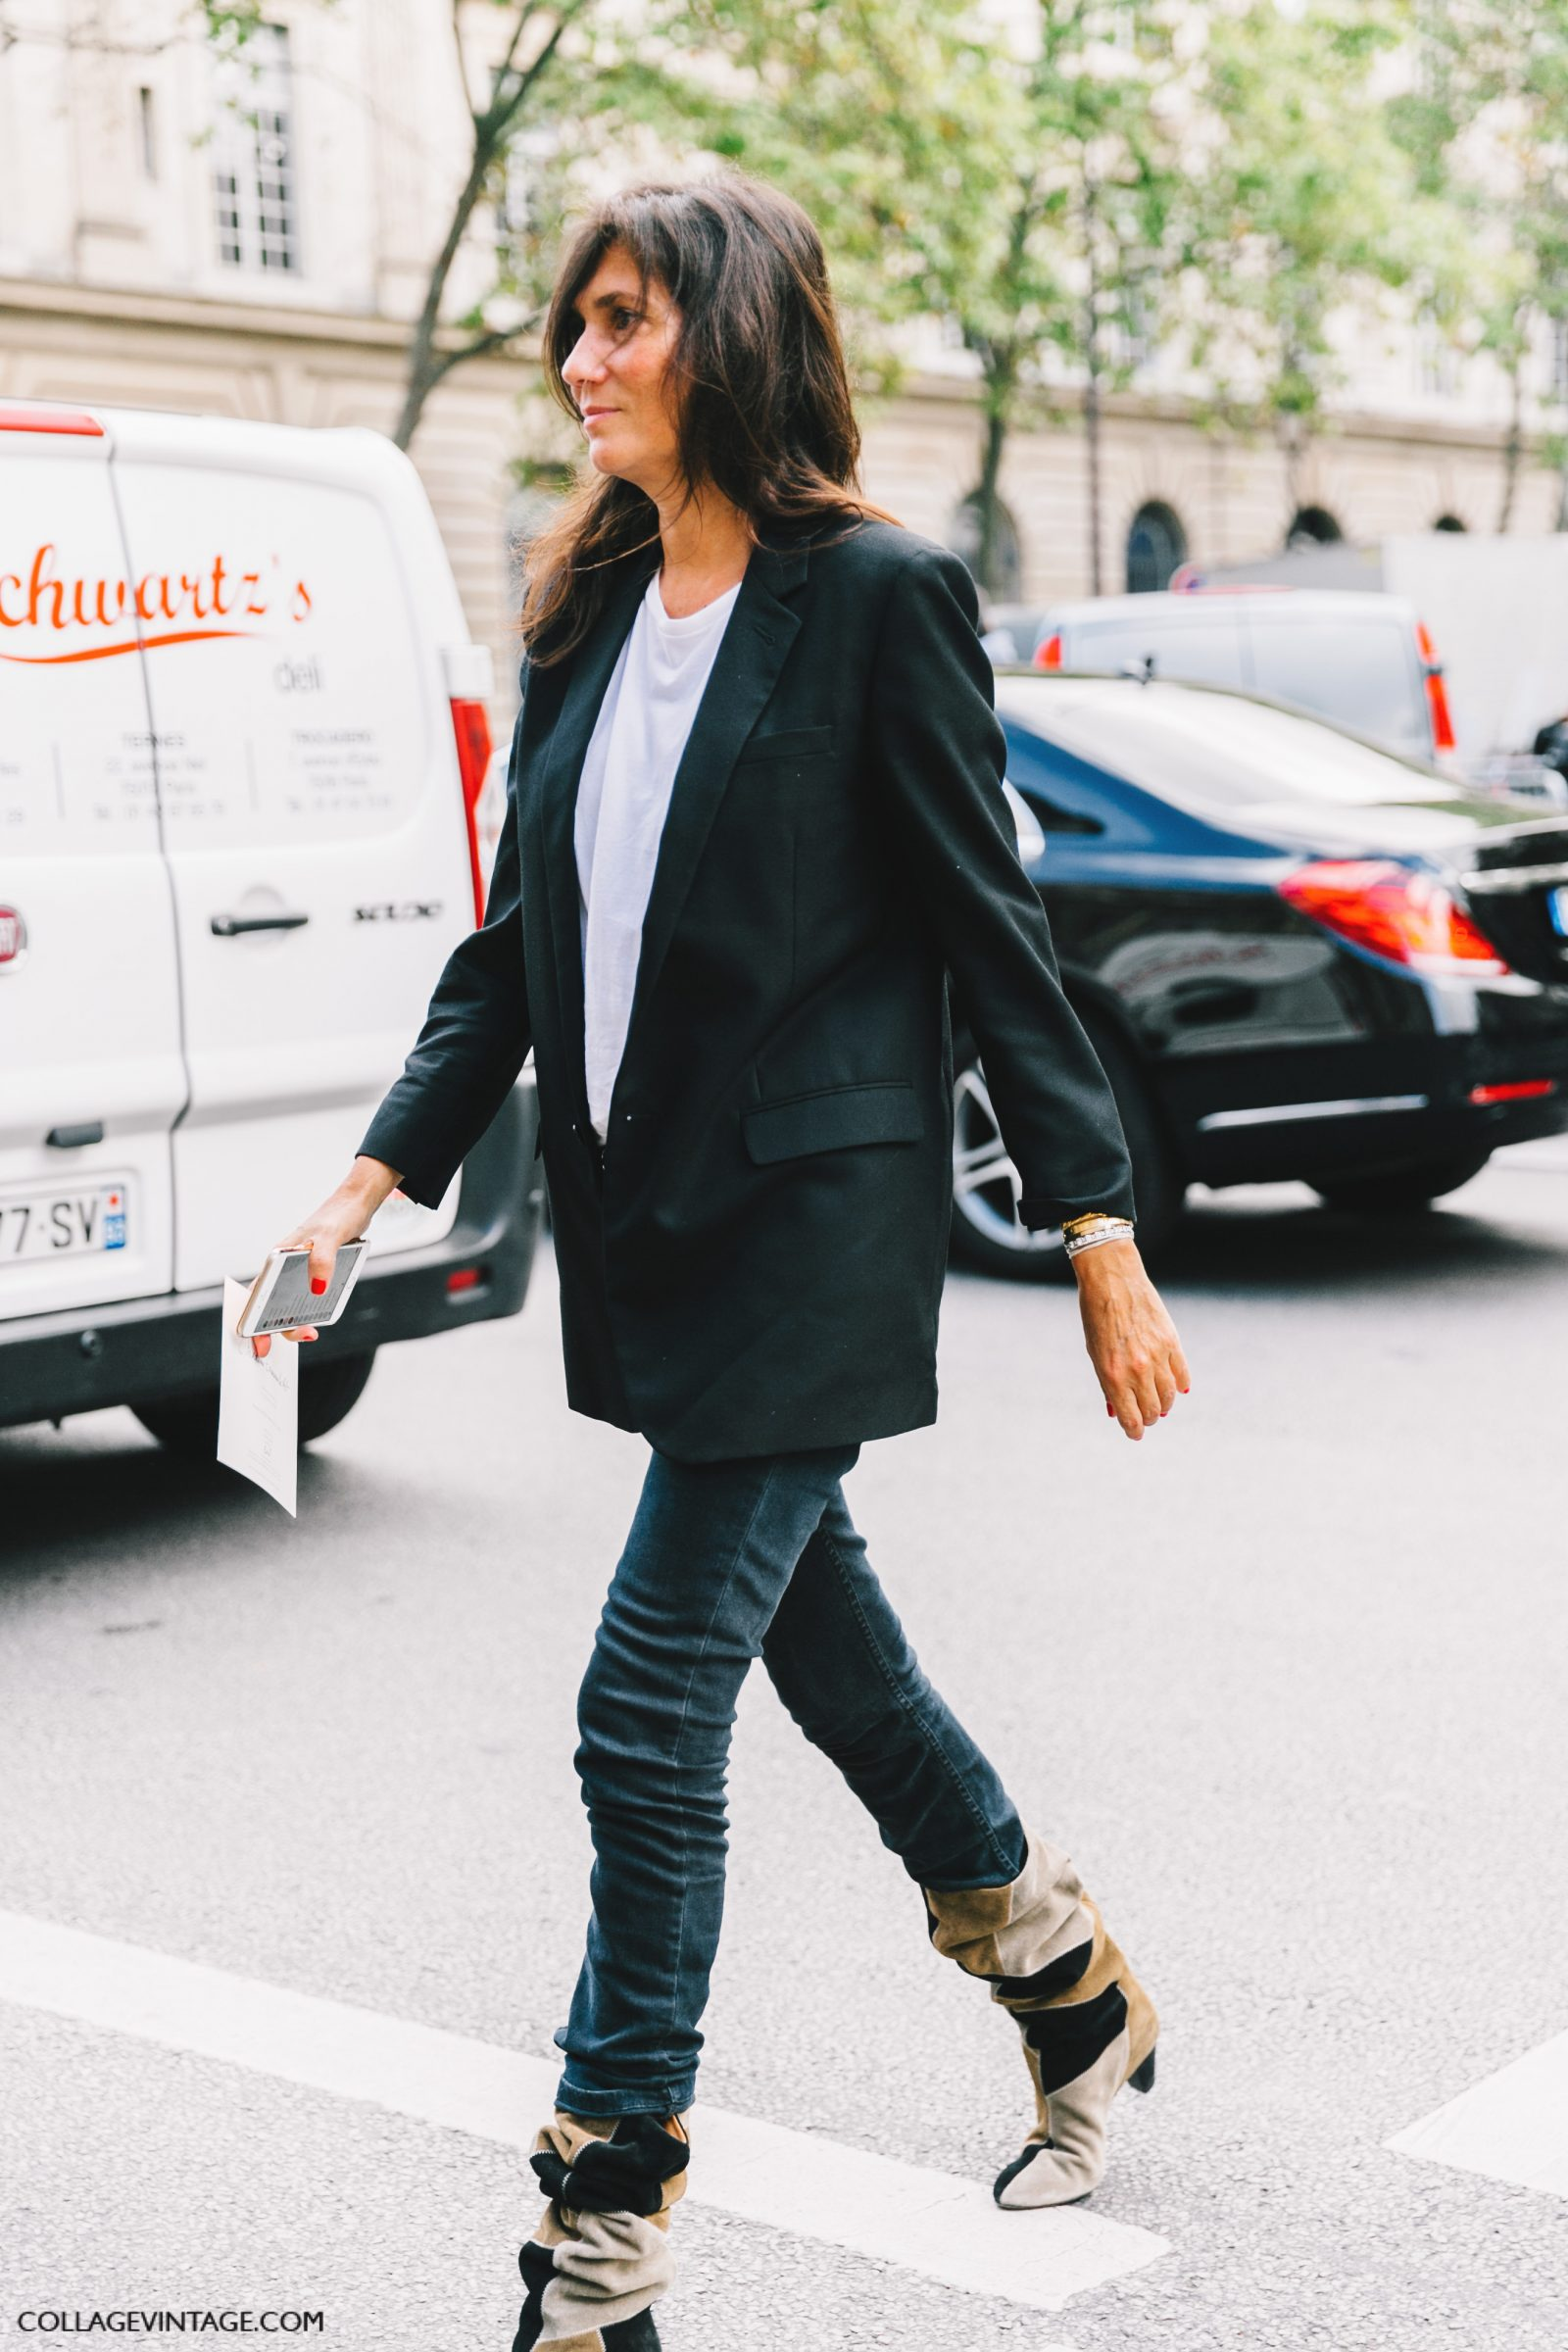 pfw-paris_fashion_week_ss17-street_style-outfits-collage_vintage-rochas-courreges-dries_van_noten-lanvin-guy_laroche-89